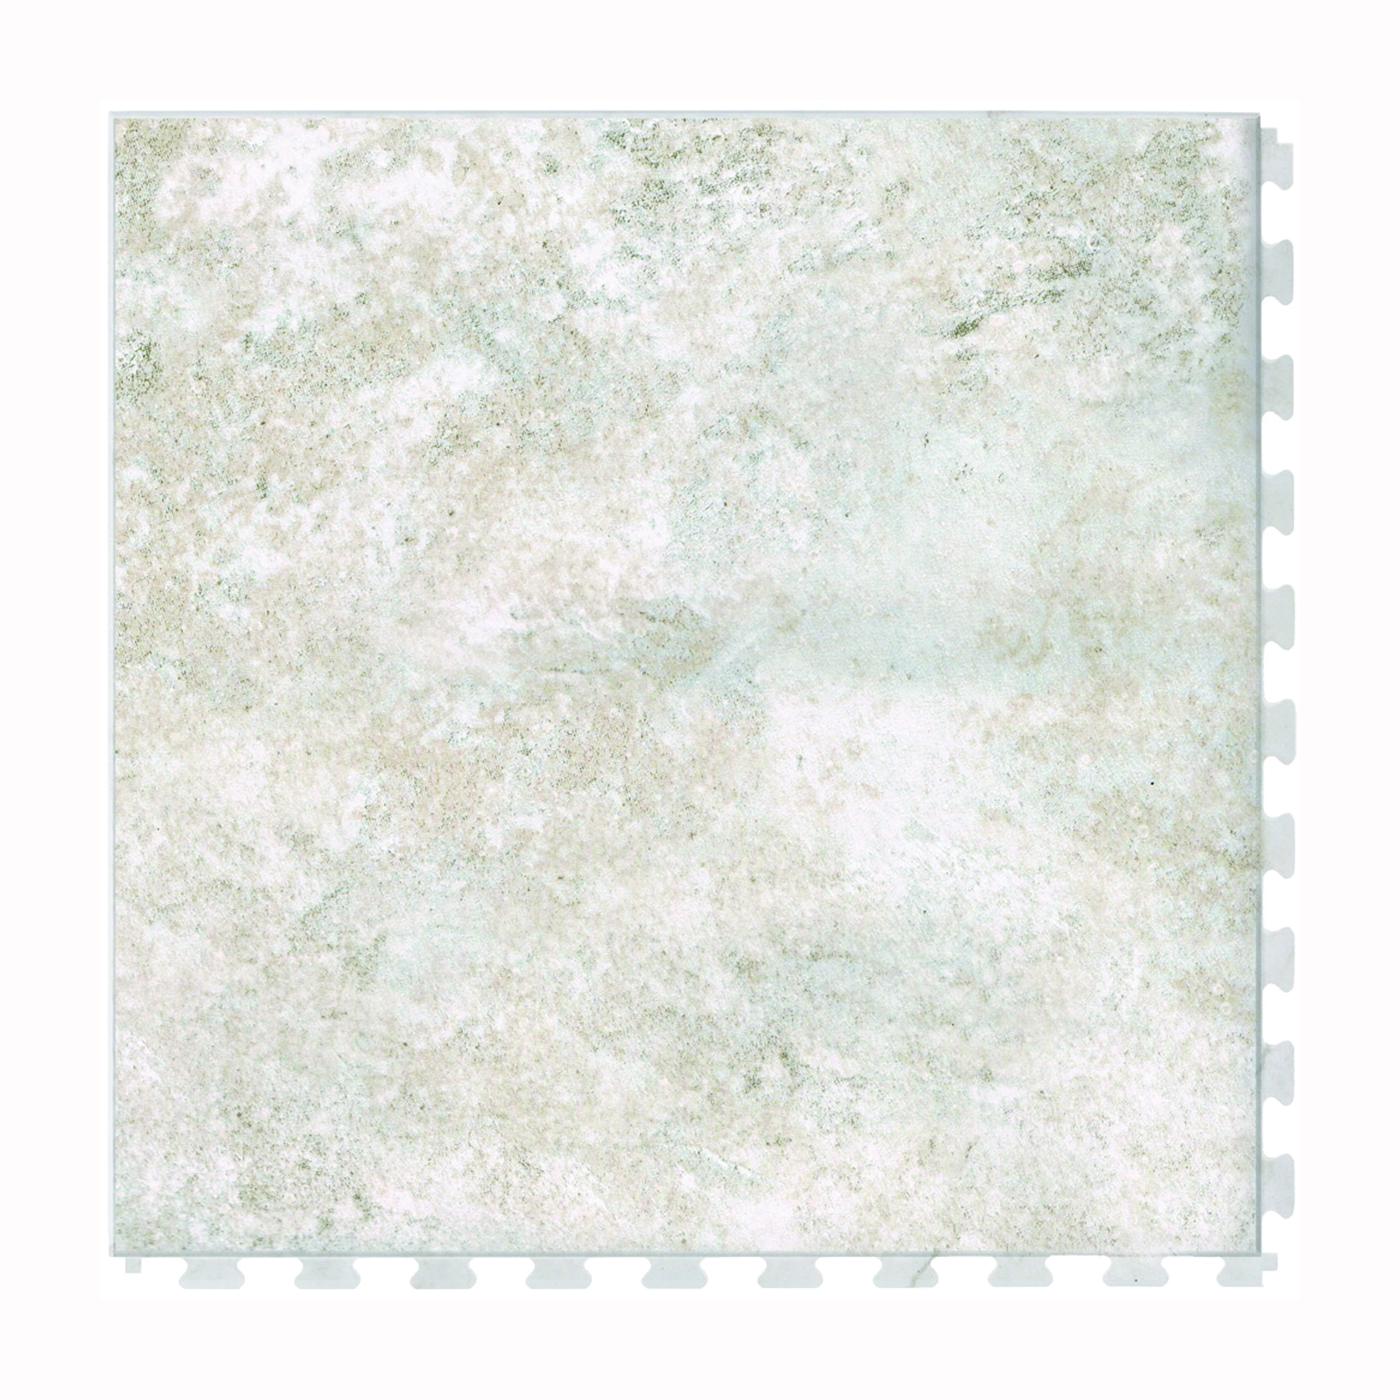 Picture of PERFECTION FLOOR TILE ITNS570FS50 Floor Tile, 20 in L Tile, 20 in W Tile, Granite Pattern, Fieldtone